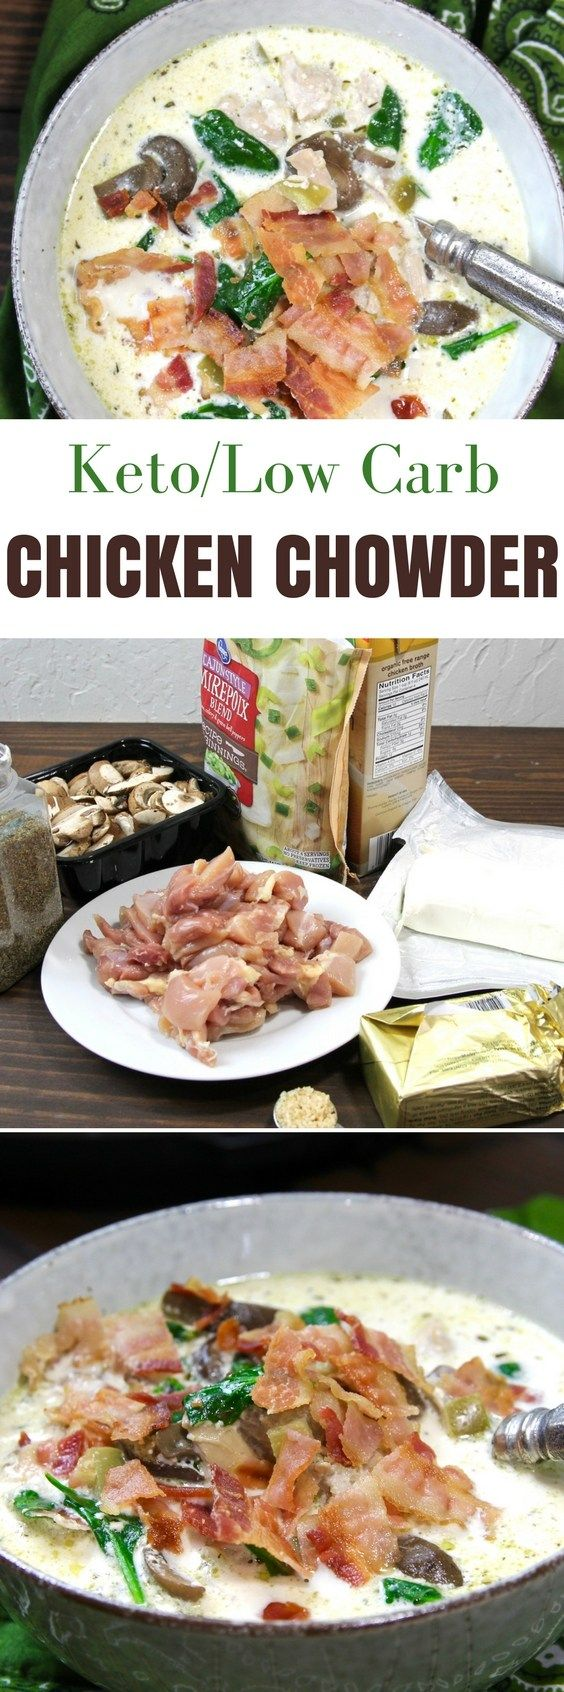 Keto Instant Pot Chicken Bacon Chowder | http://5dinners1hour.com/keto-instant-pot-chicken-bacon-chowder/